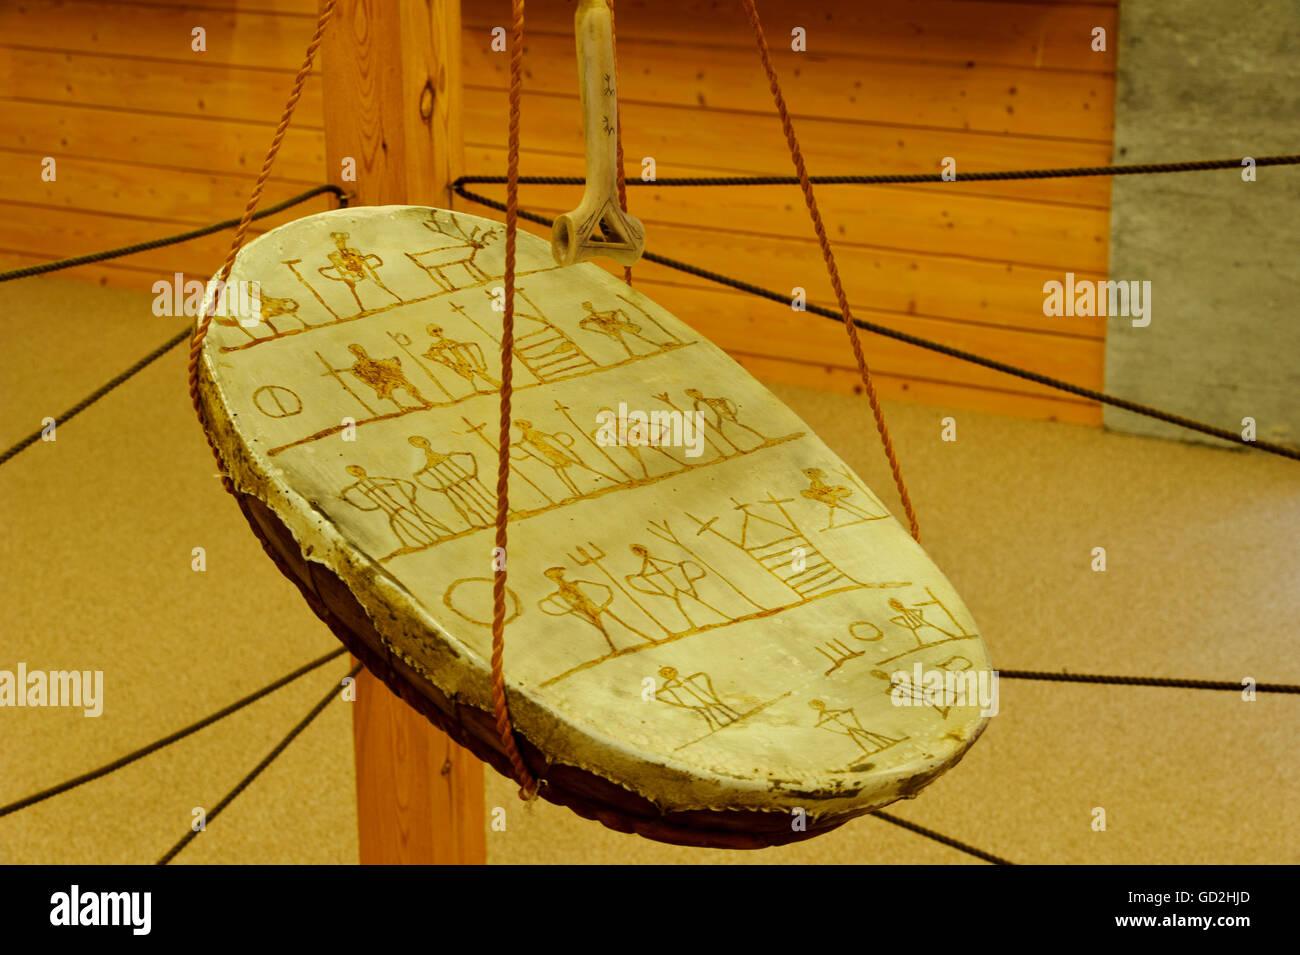 music, musical instrument, magic drum of the shamans in the museum of Karasjok, Norway, Sami people, Saami, Lapps, - Stock Image